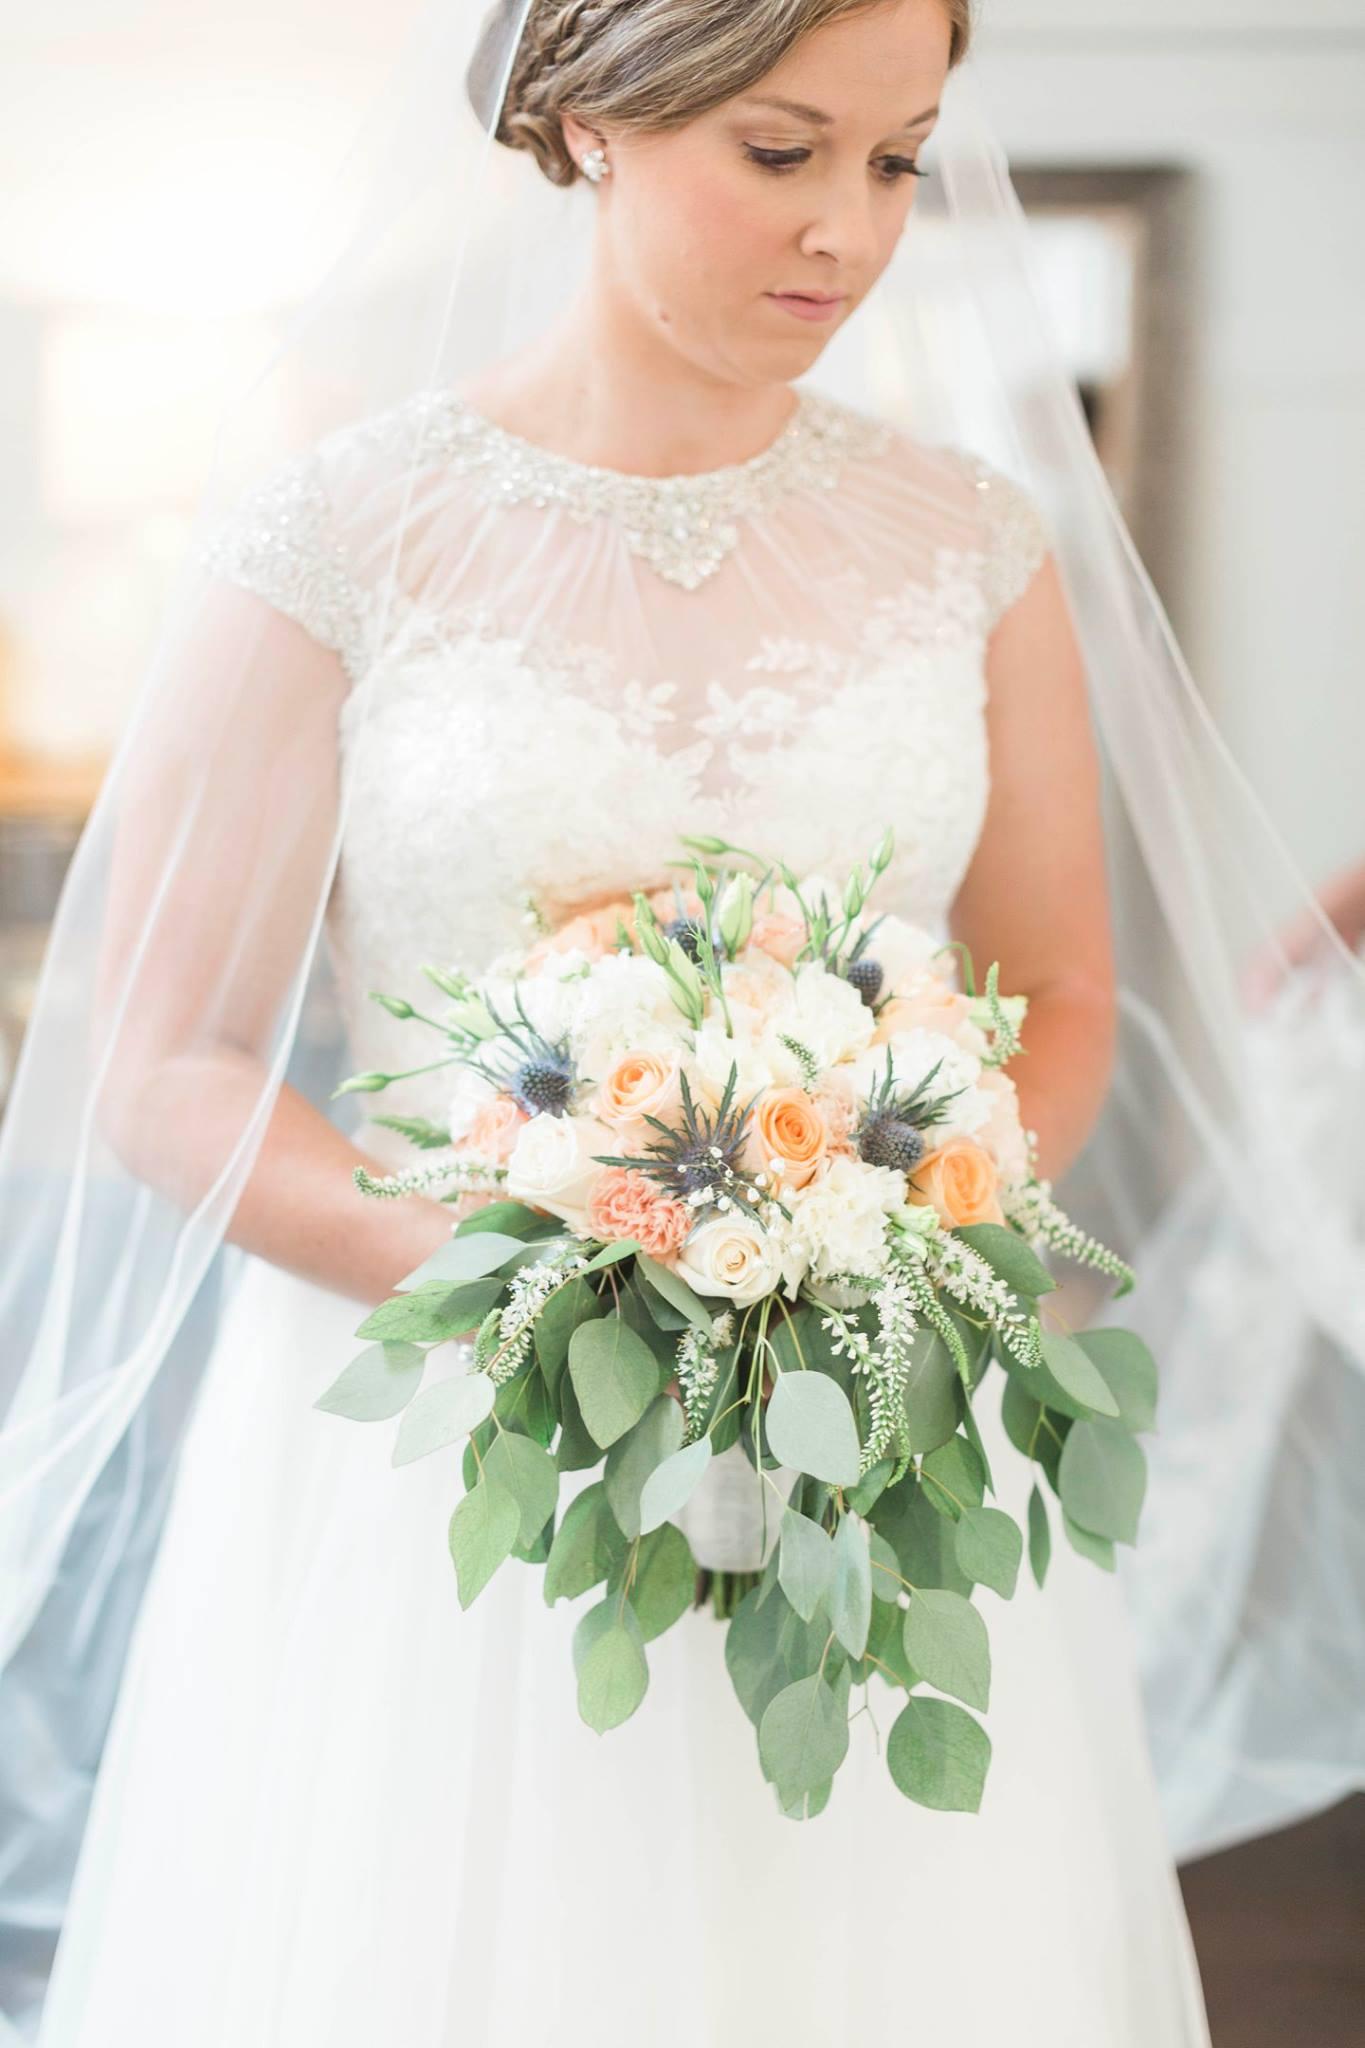 Sarah Larson/Ivey Wedding- Wedding  Foxhall Resorts,  Stables   Photographer: Will Carson Photography